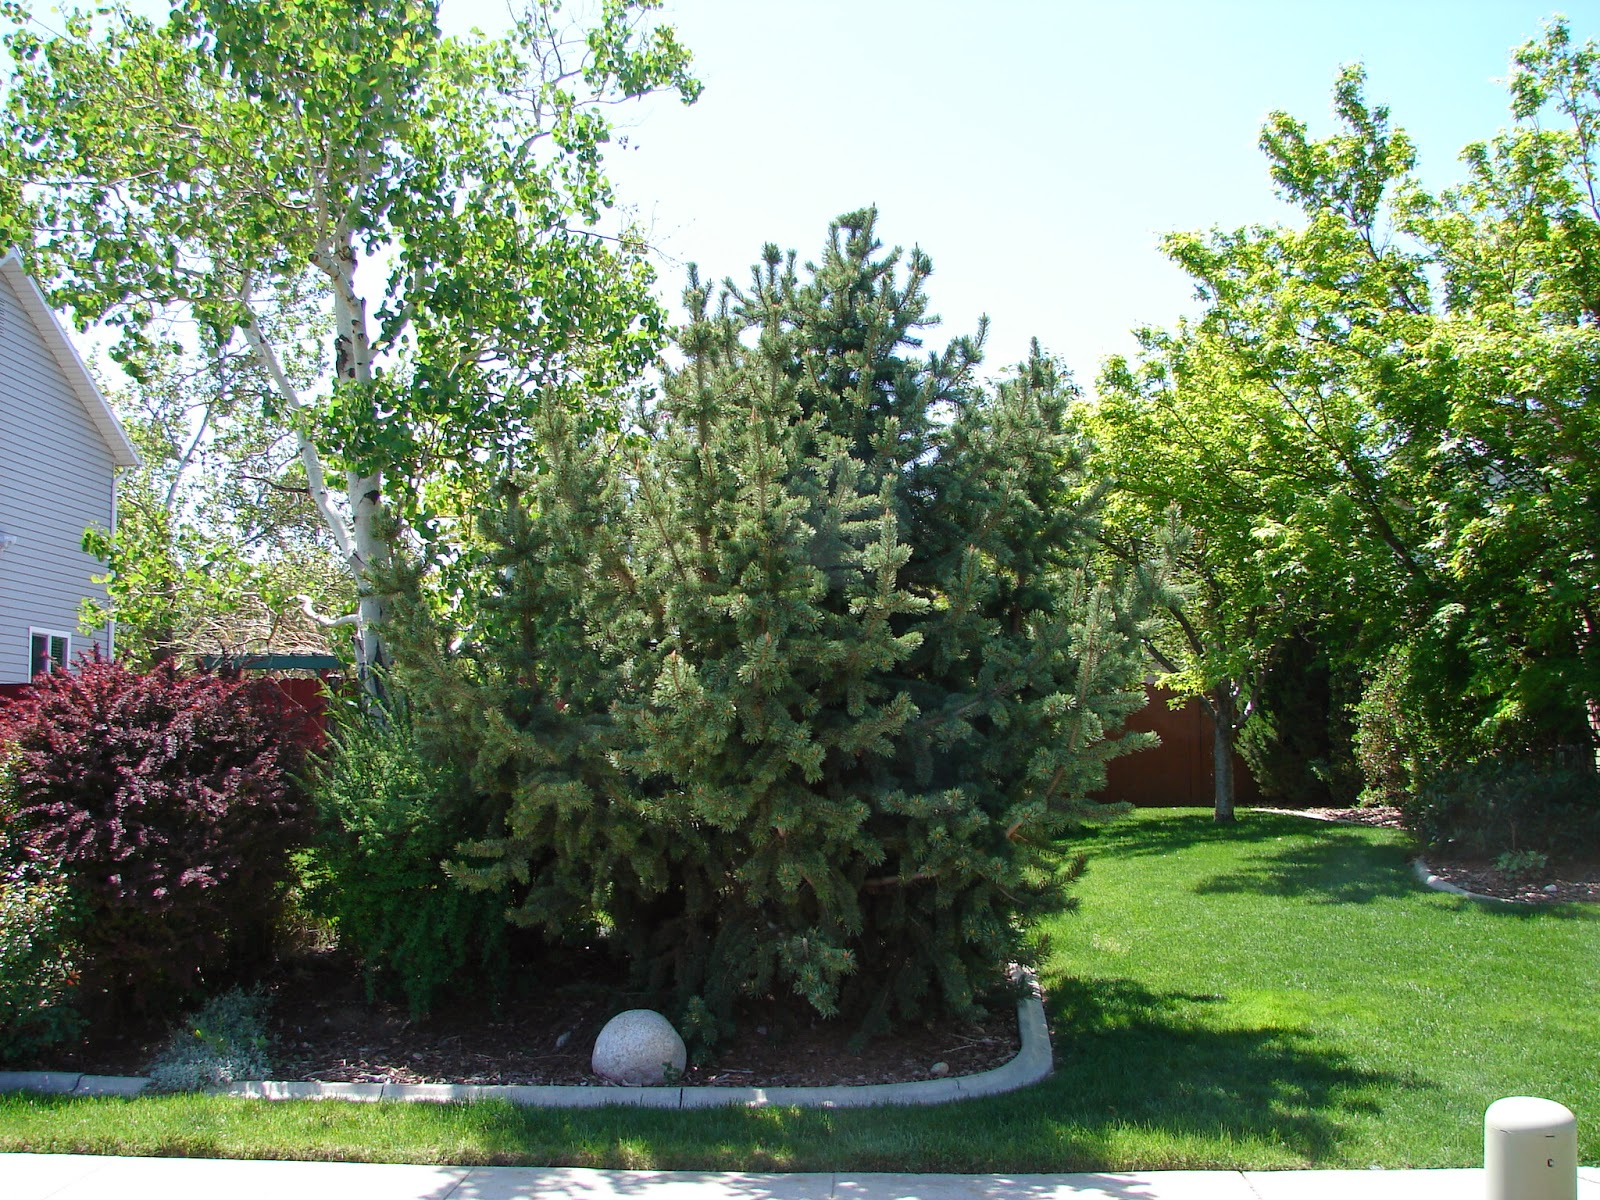 New Utah Gardener: Bristlecone Pine - Drought-tolerant ...